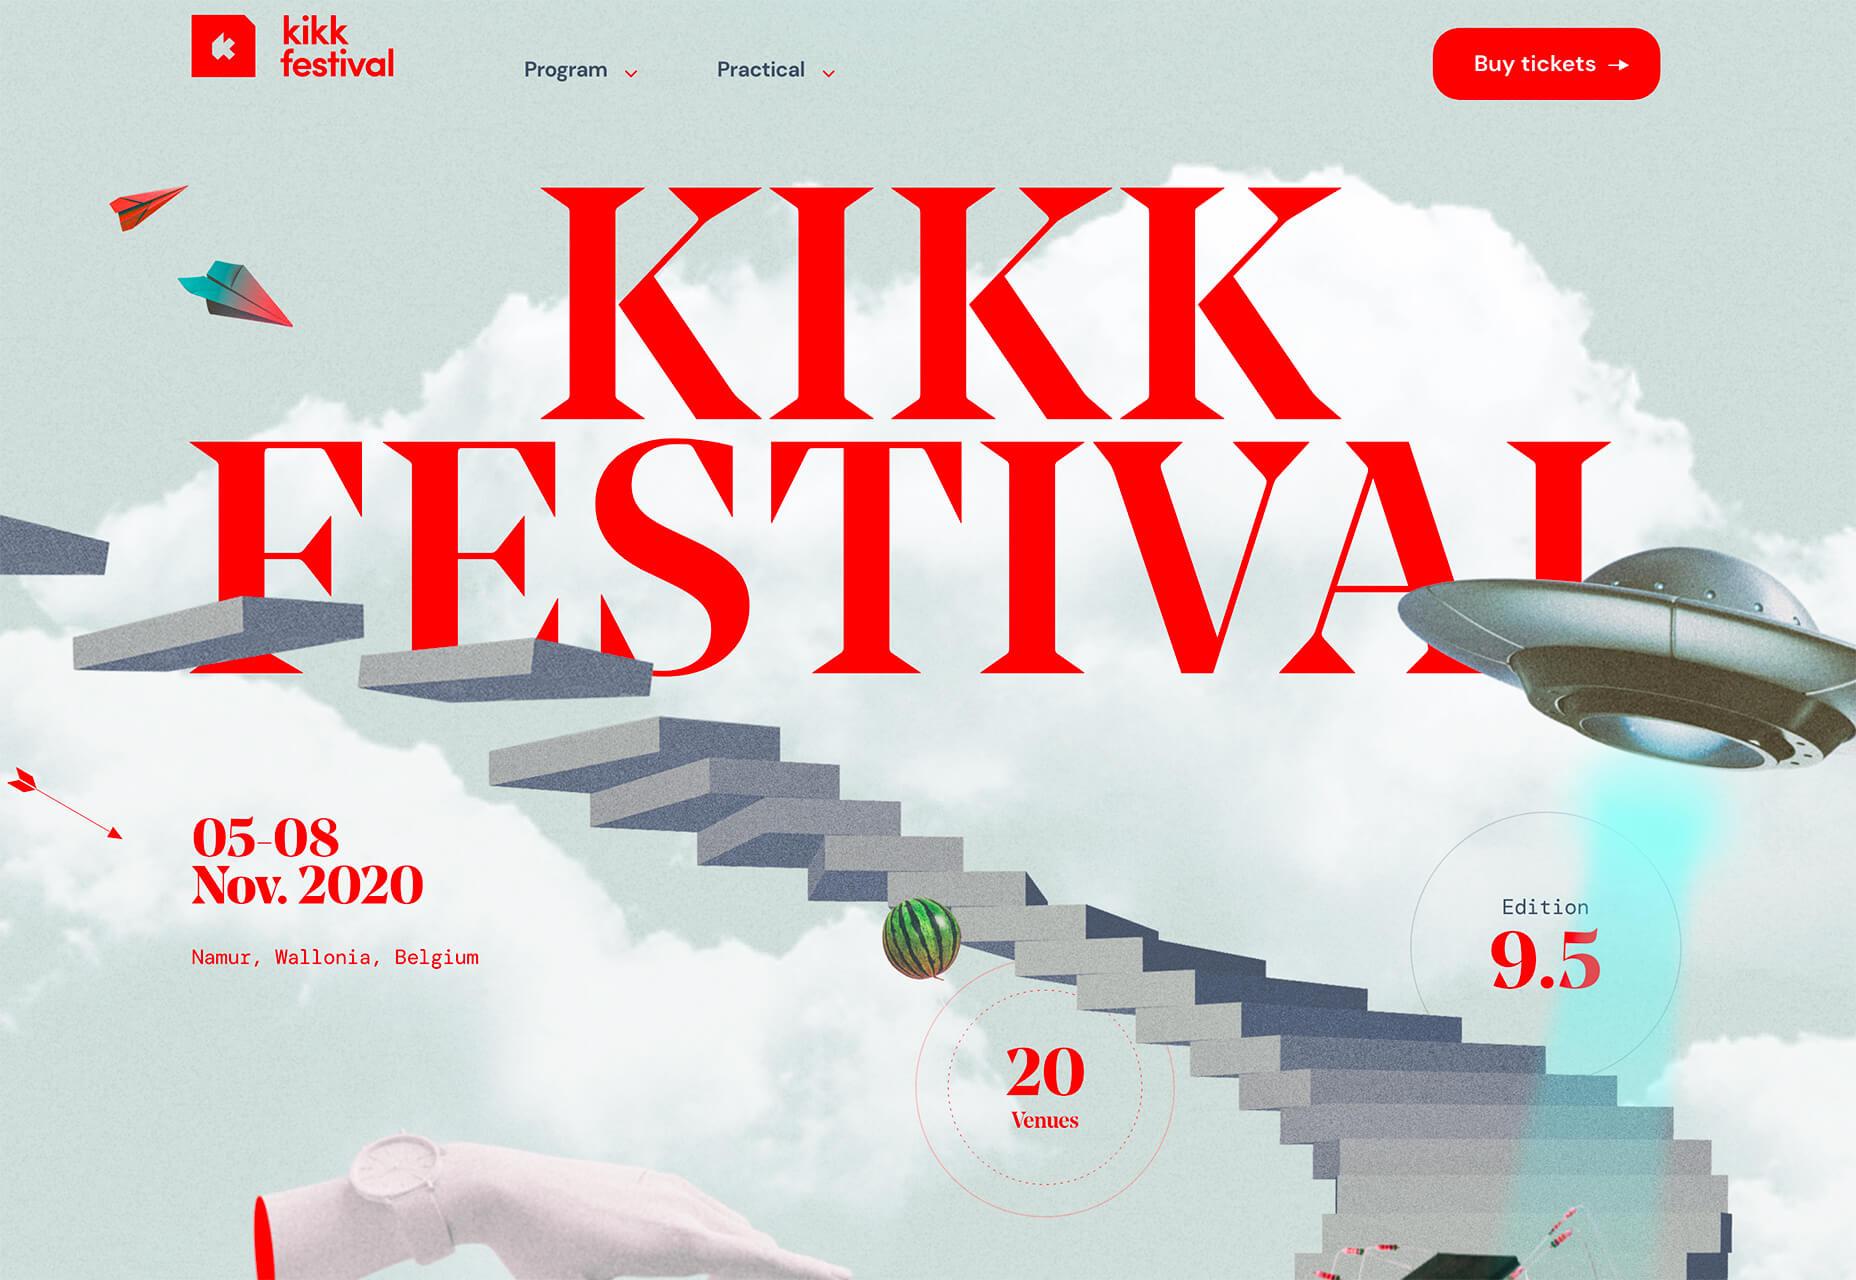 Image of kikk